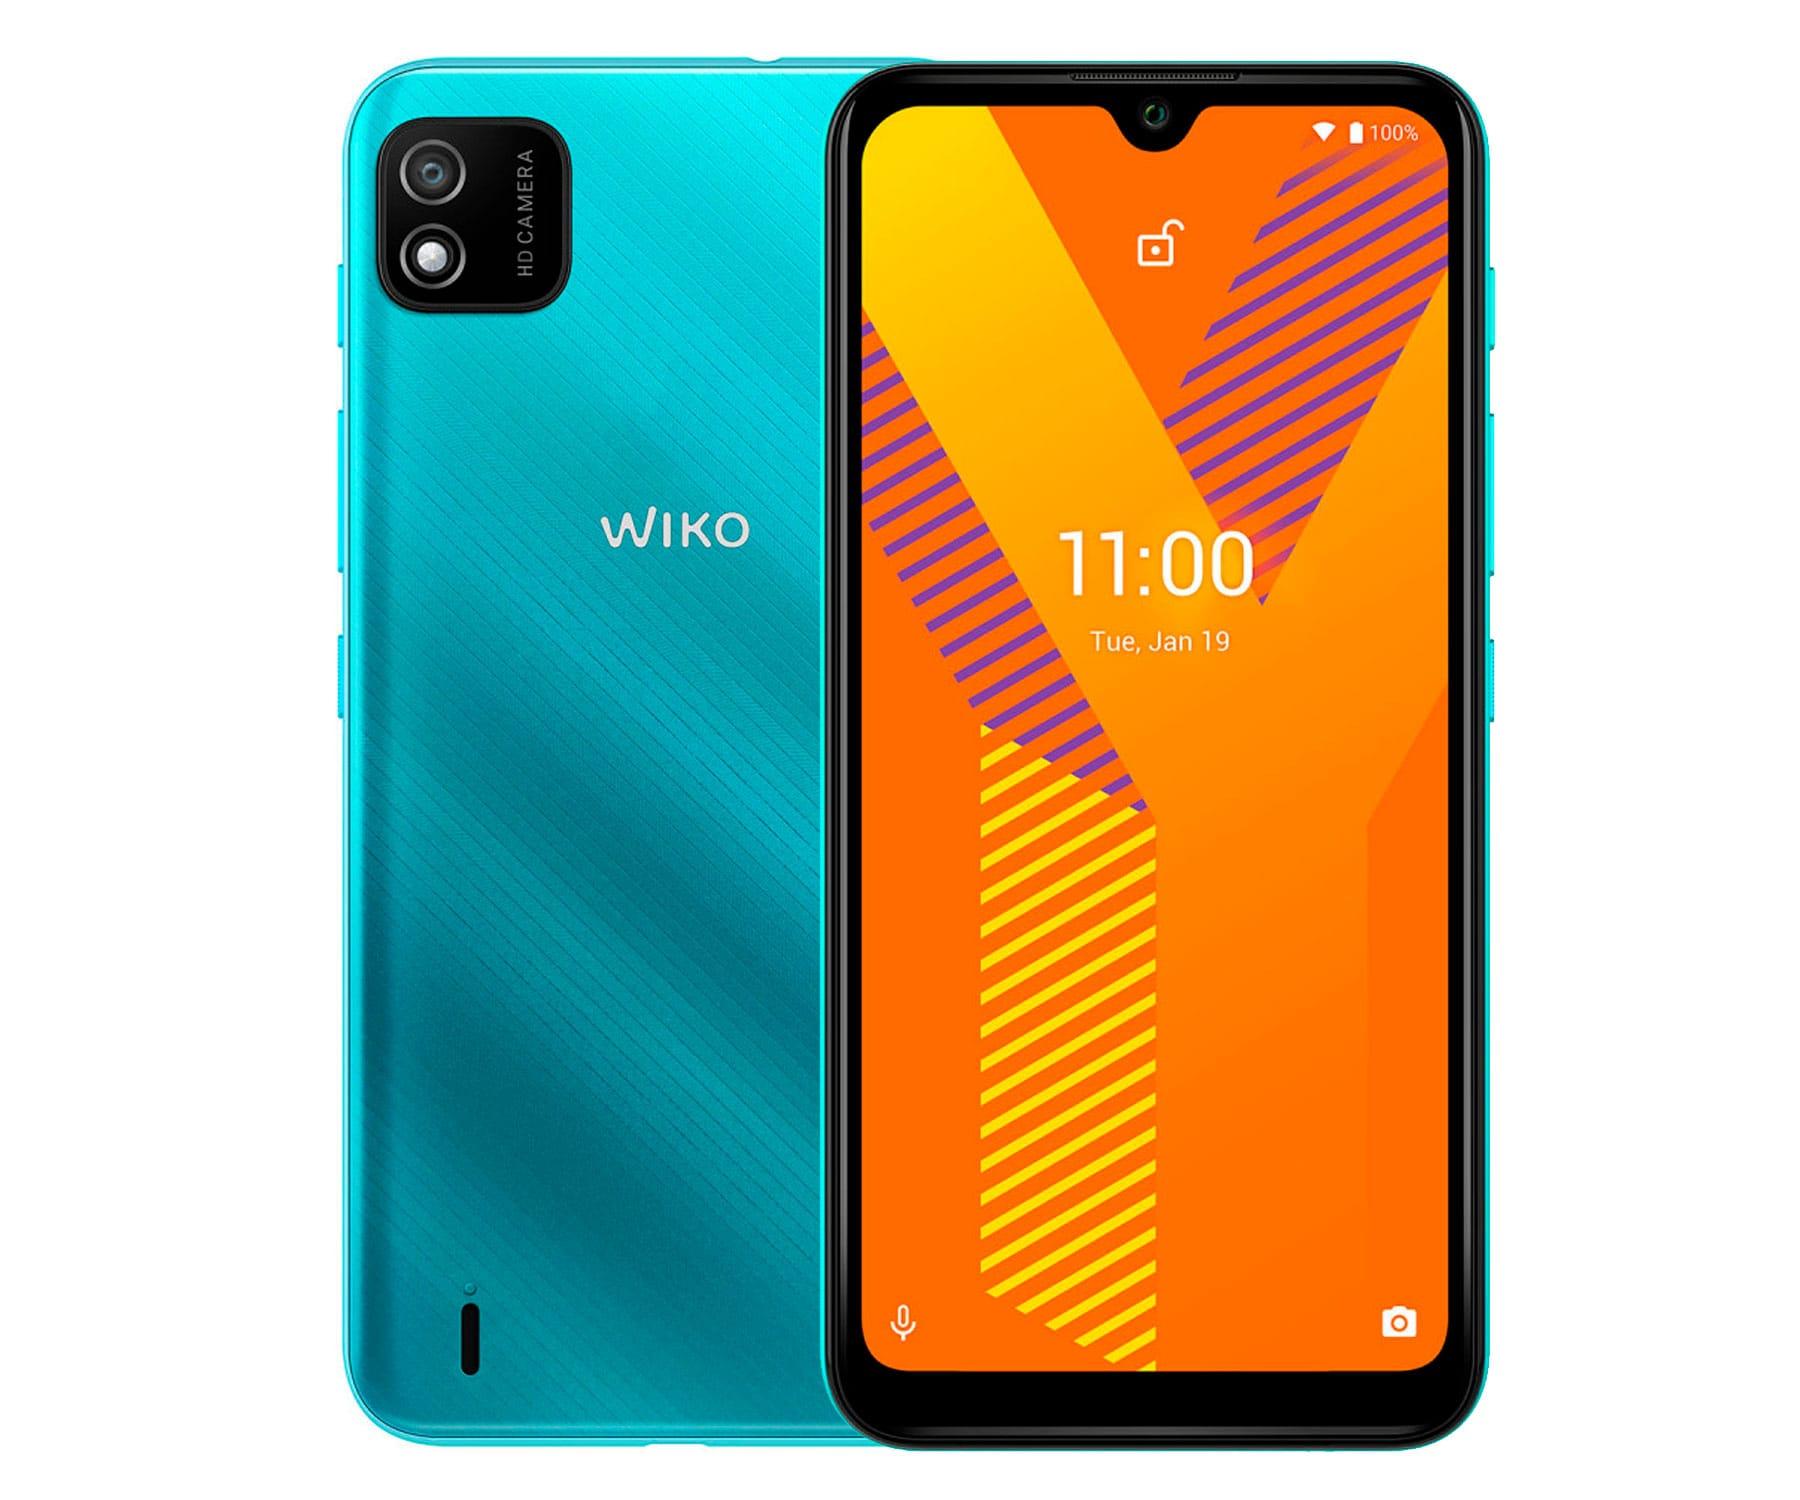 WIKO Y62 4G VERDE MENTA/4CORE/1+16GB/6.1'' HD+/DUAL SIM